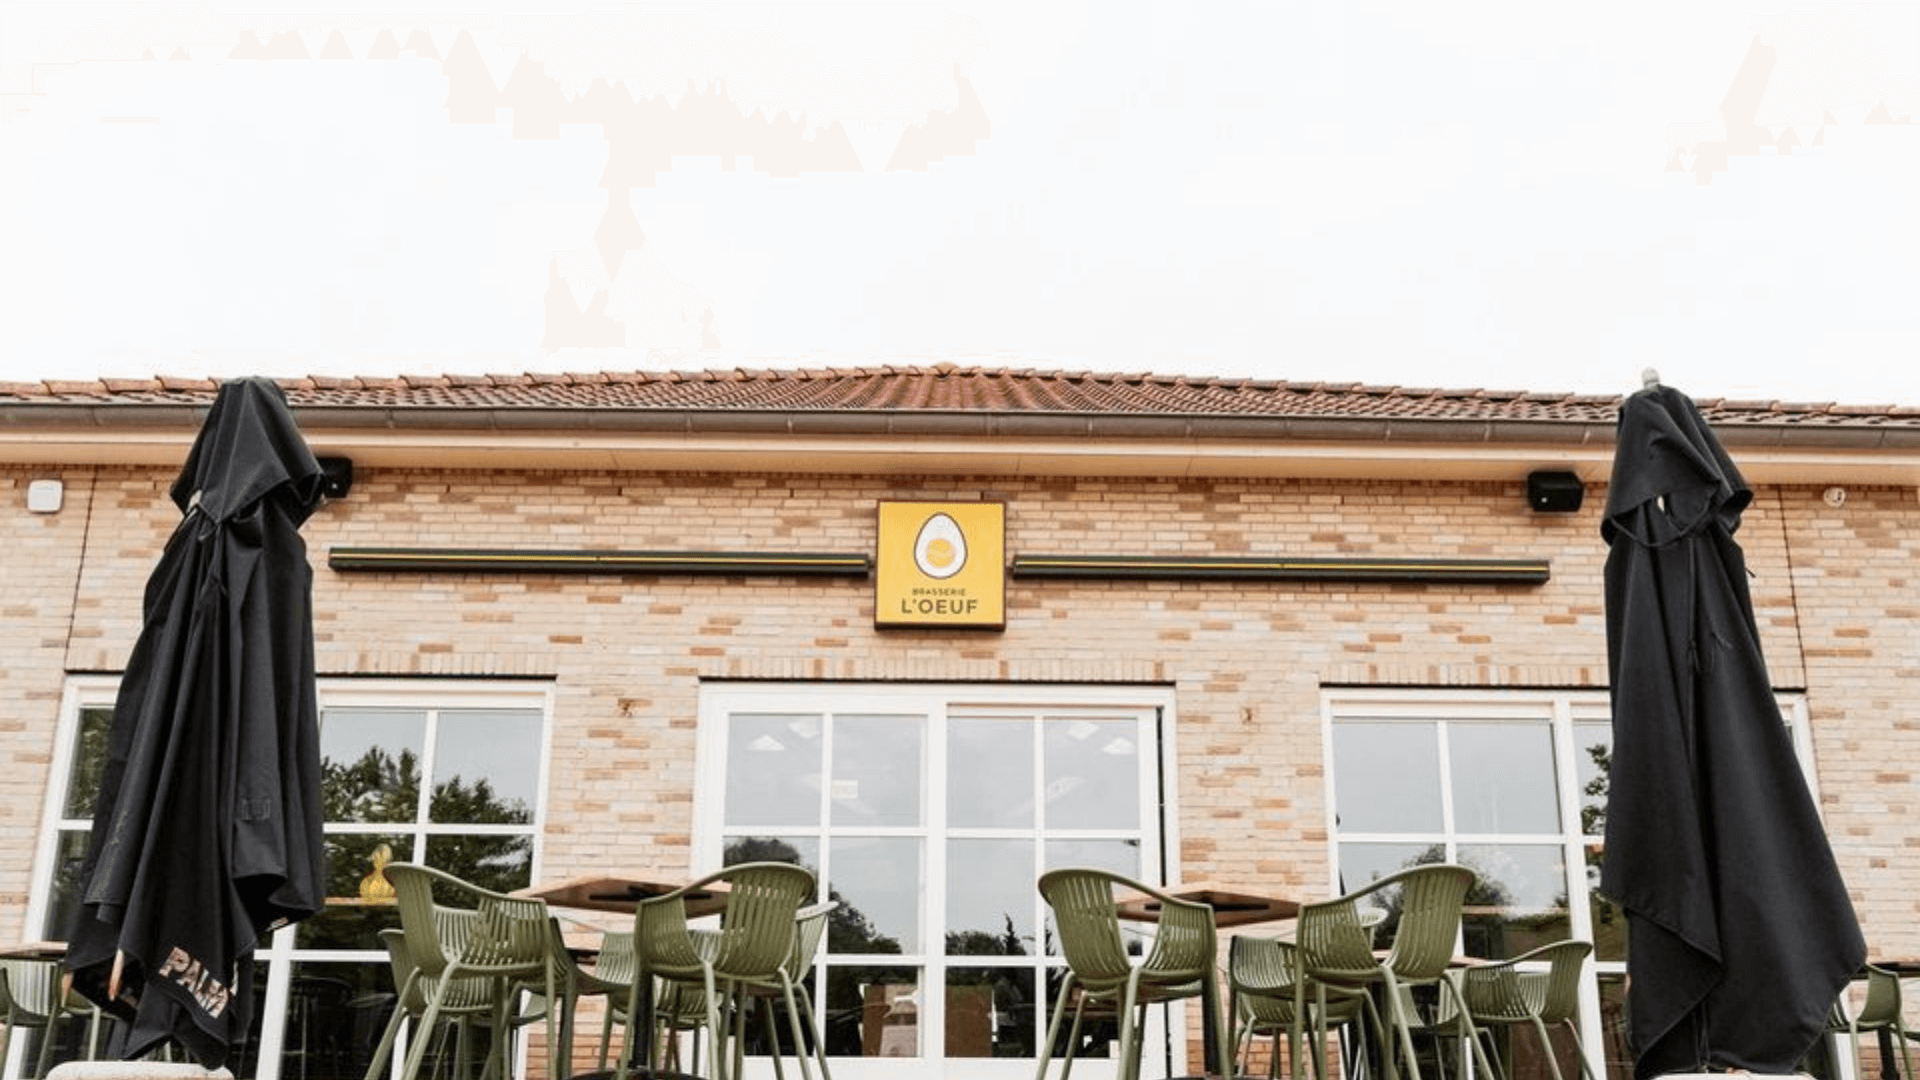 Brasserie L'Oeuf